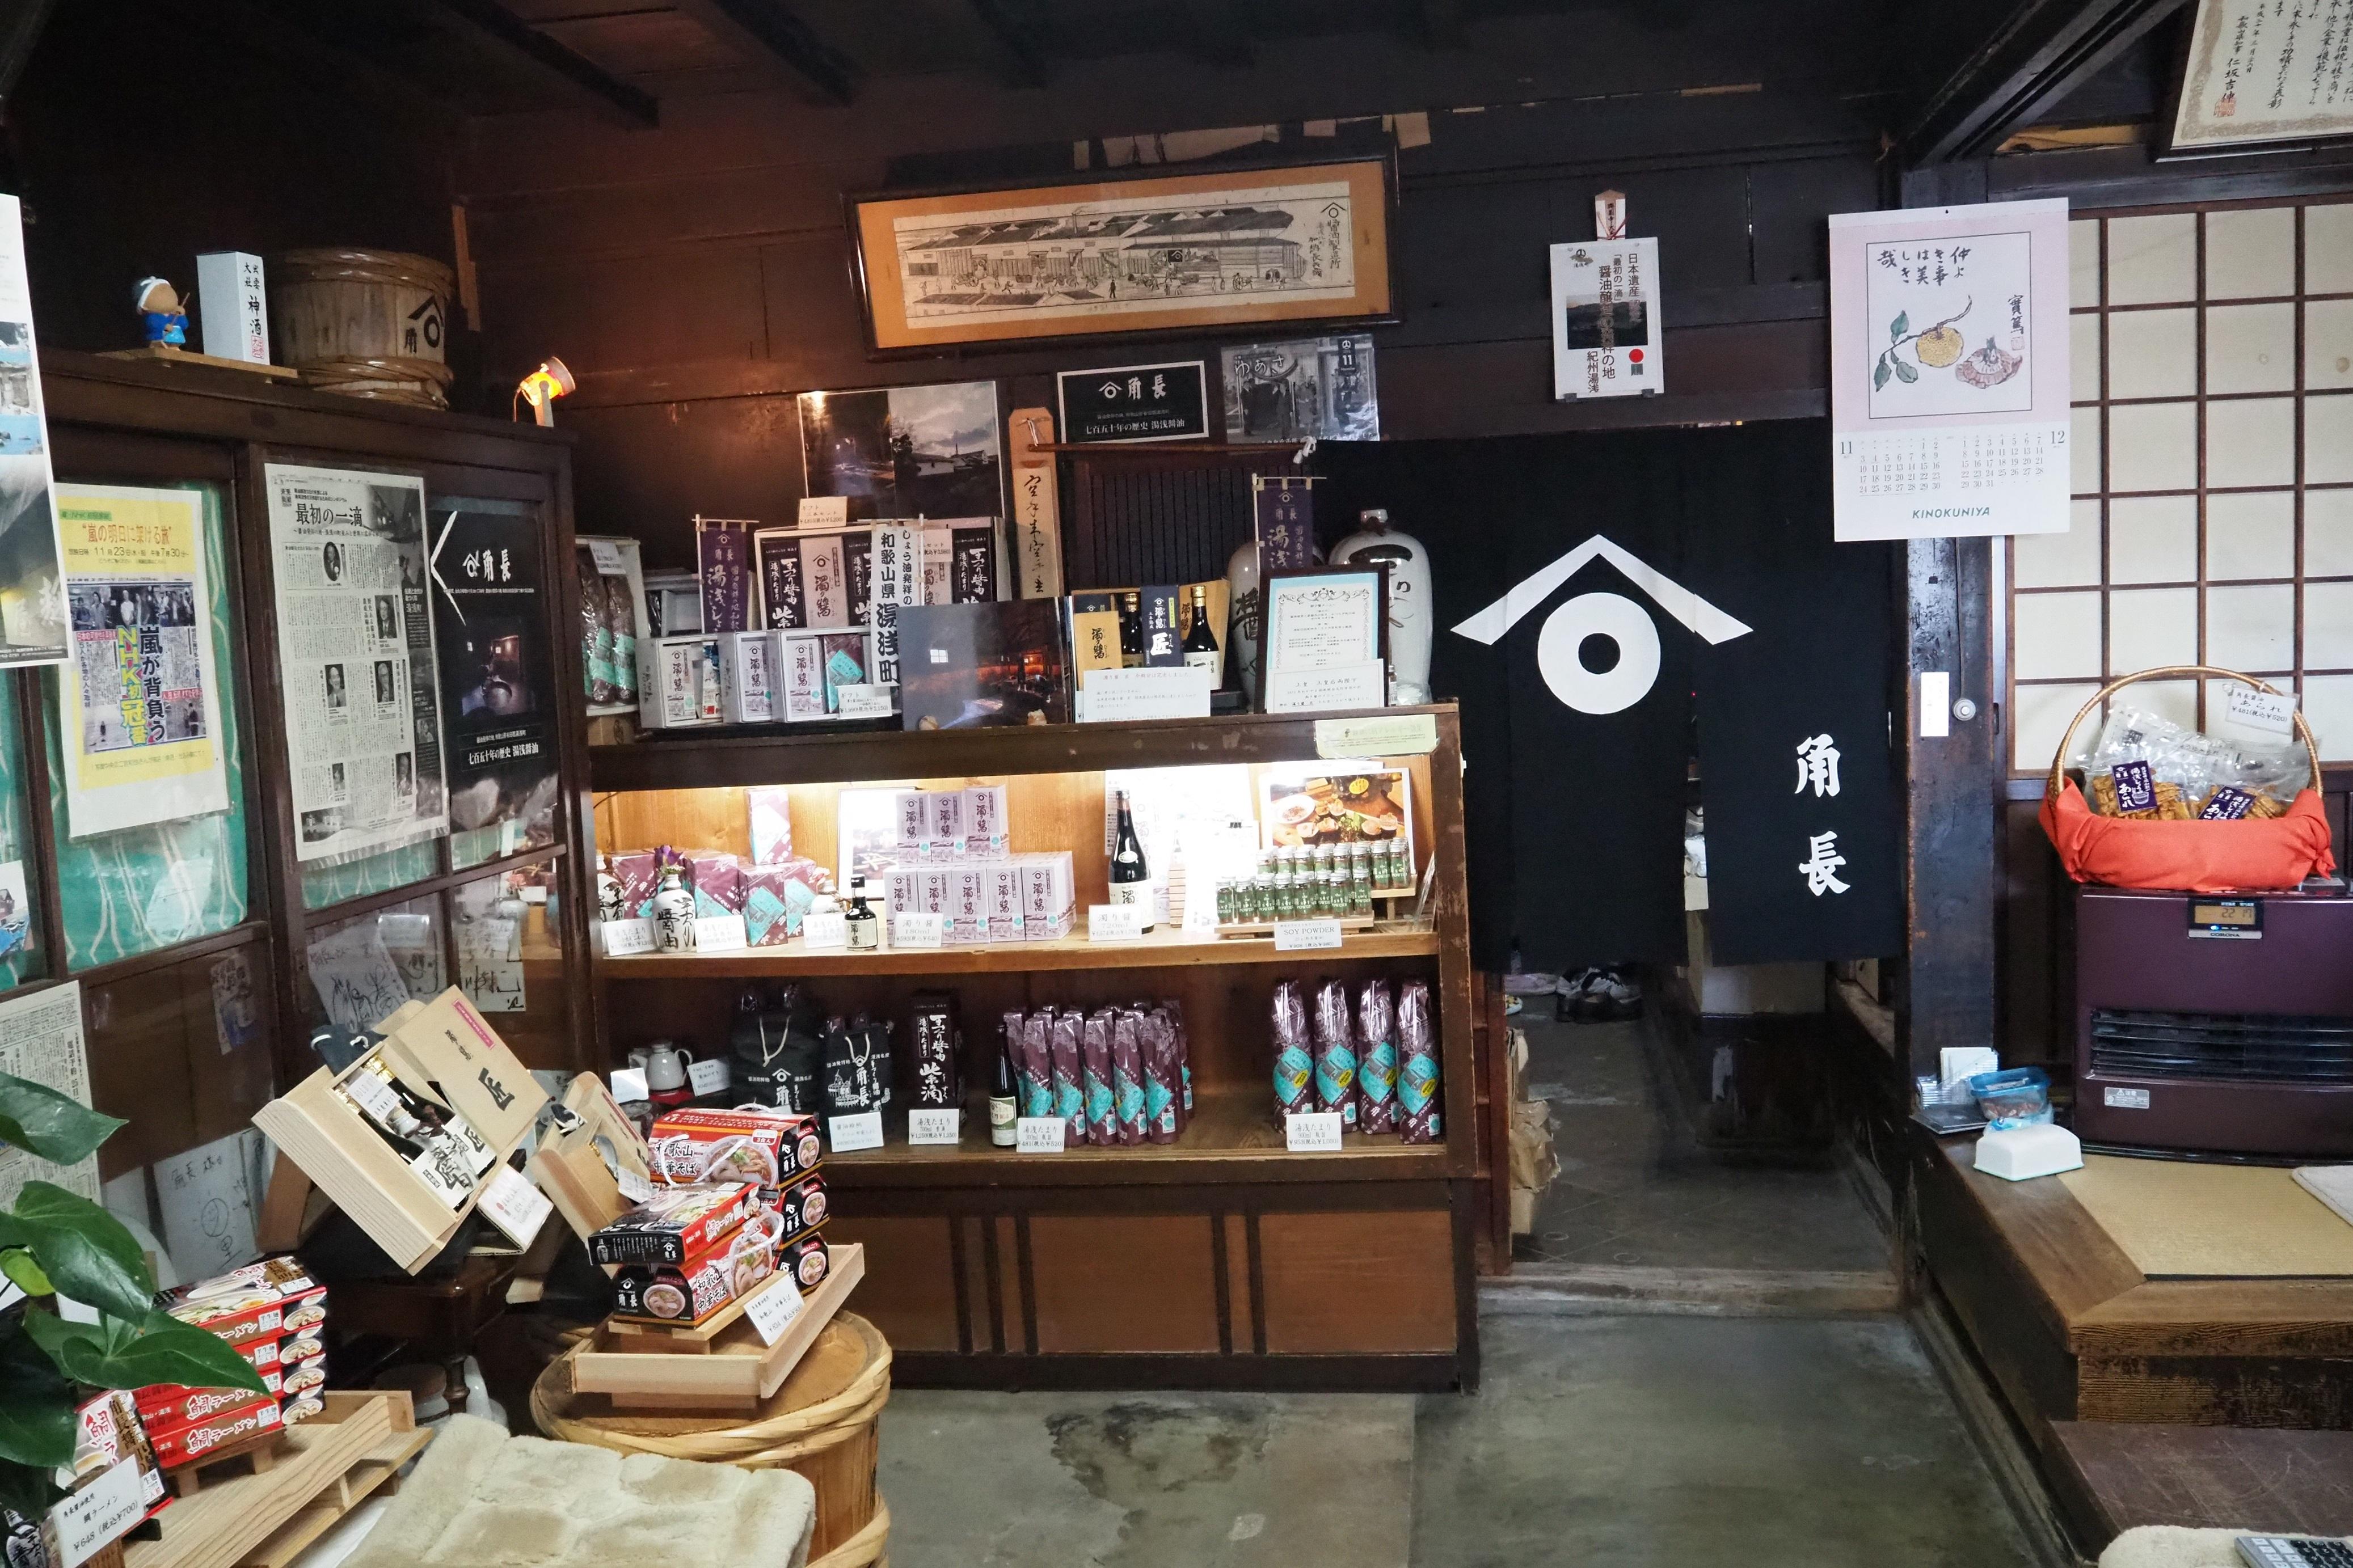 motorcycle-touring-blog-wakayama-yuasatown-soysauce-kadochou-inside.jpg